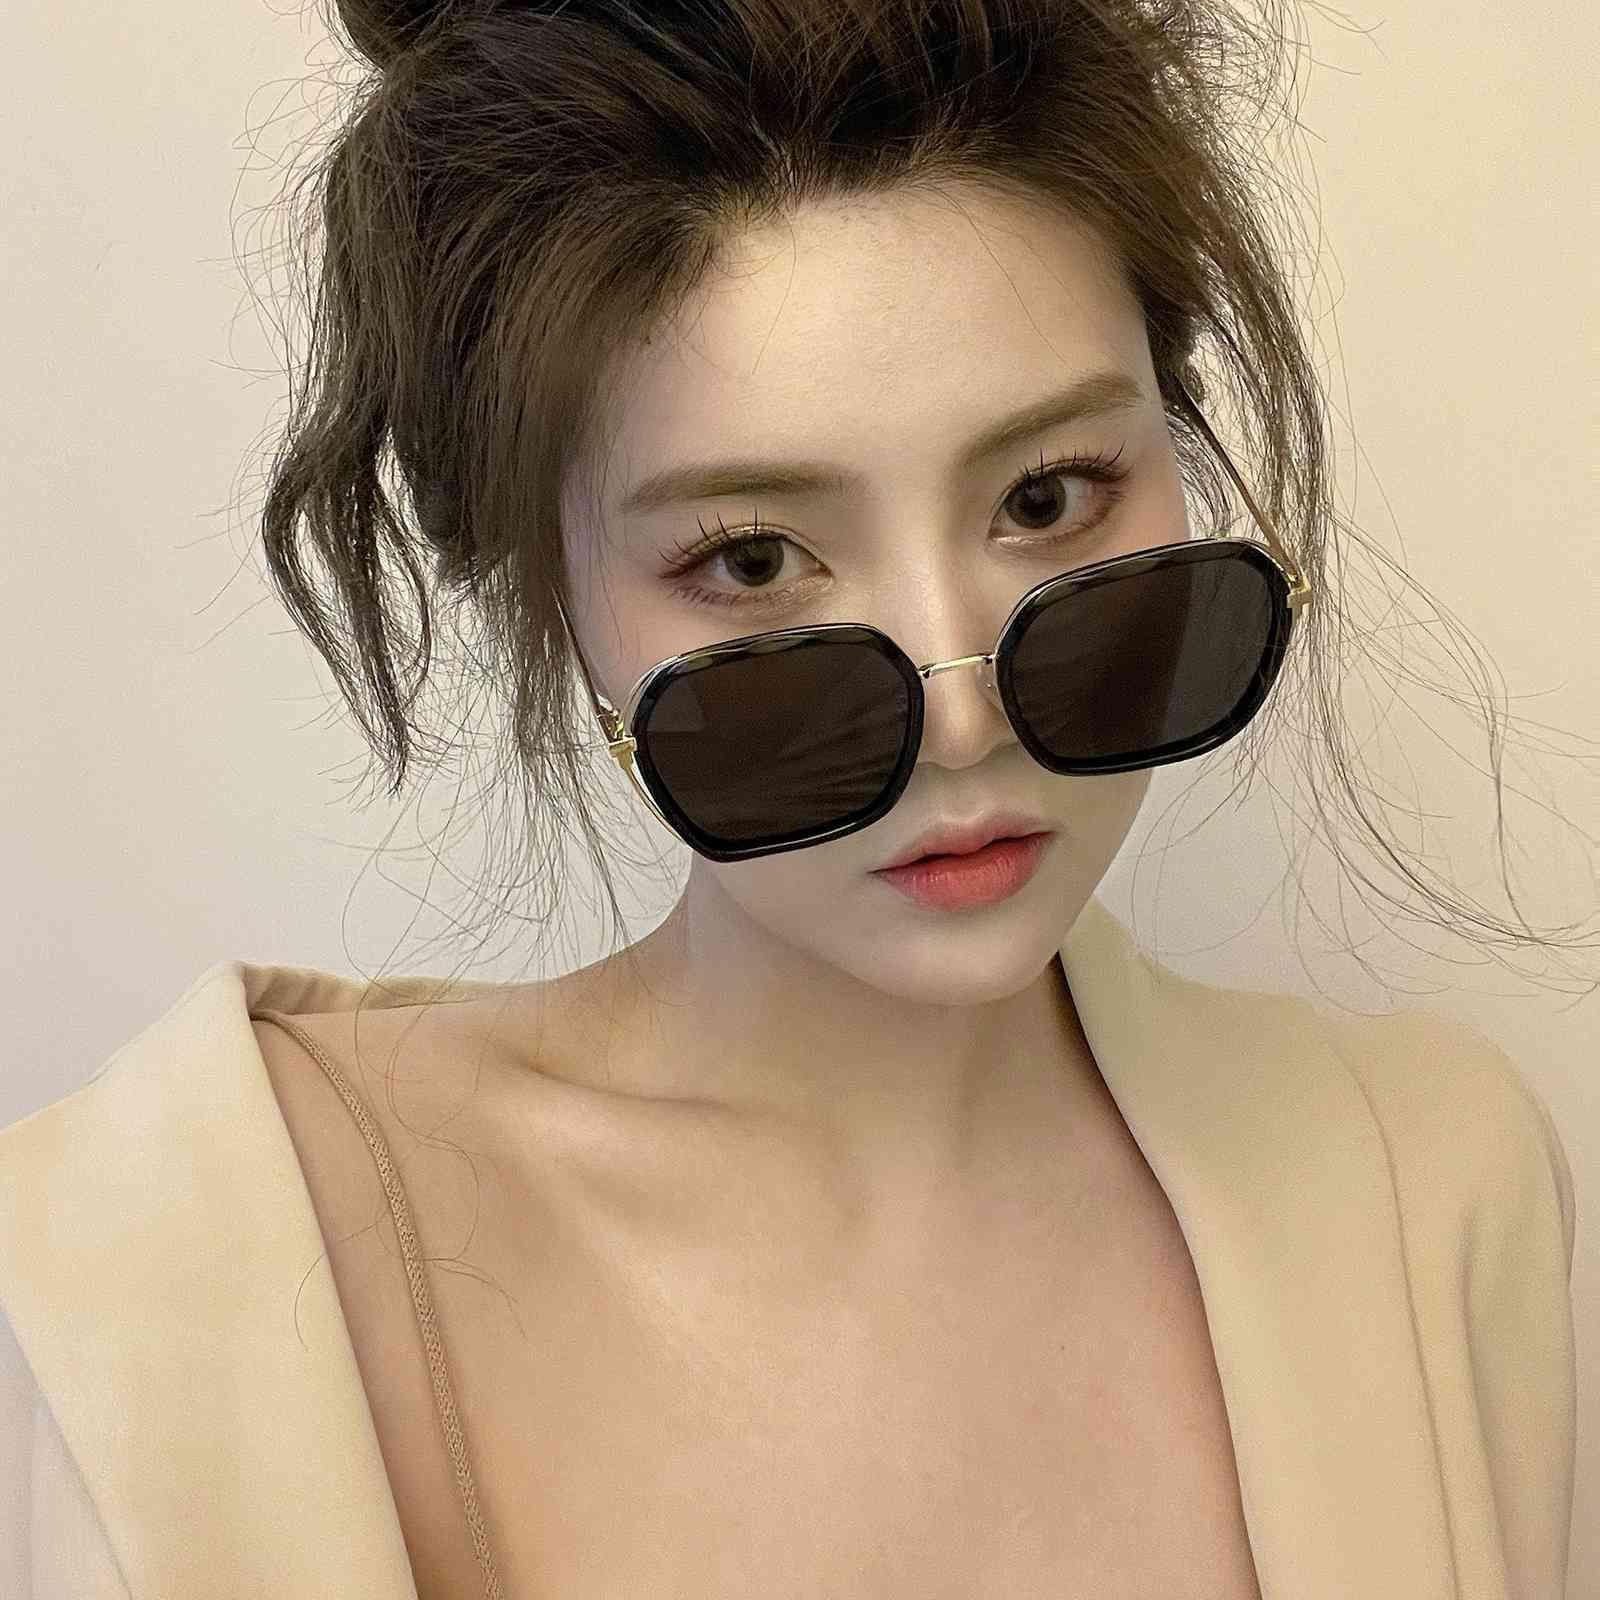 2021 Korean version new net red Polarized Sunglass Women's trendy large frame sunglass driving sun visors